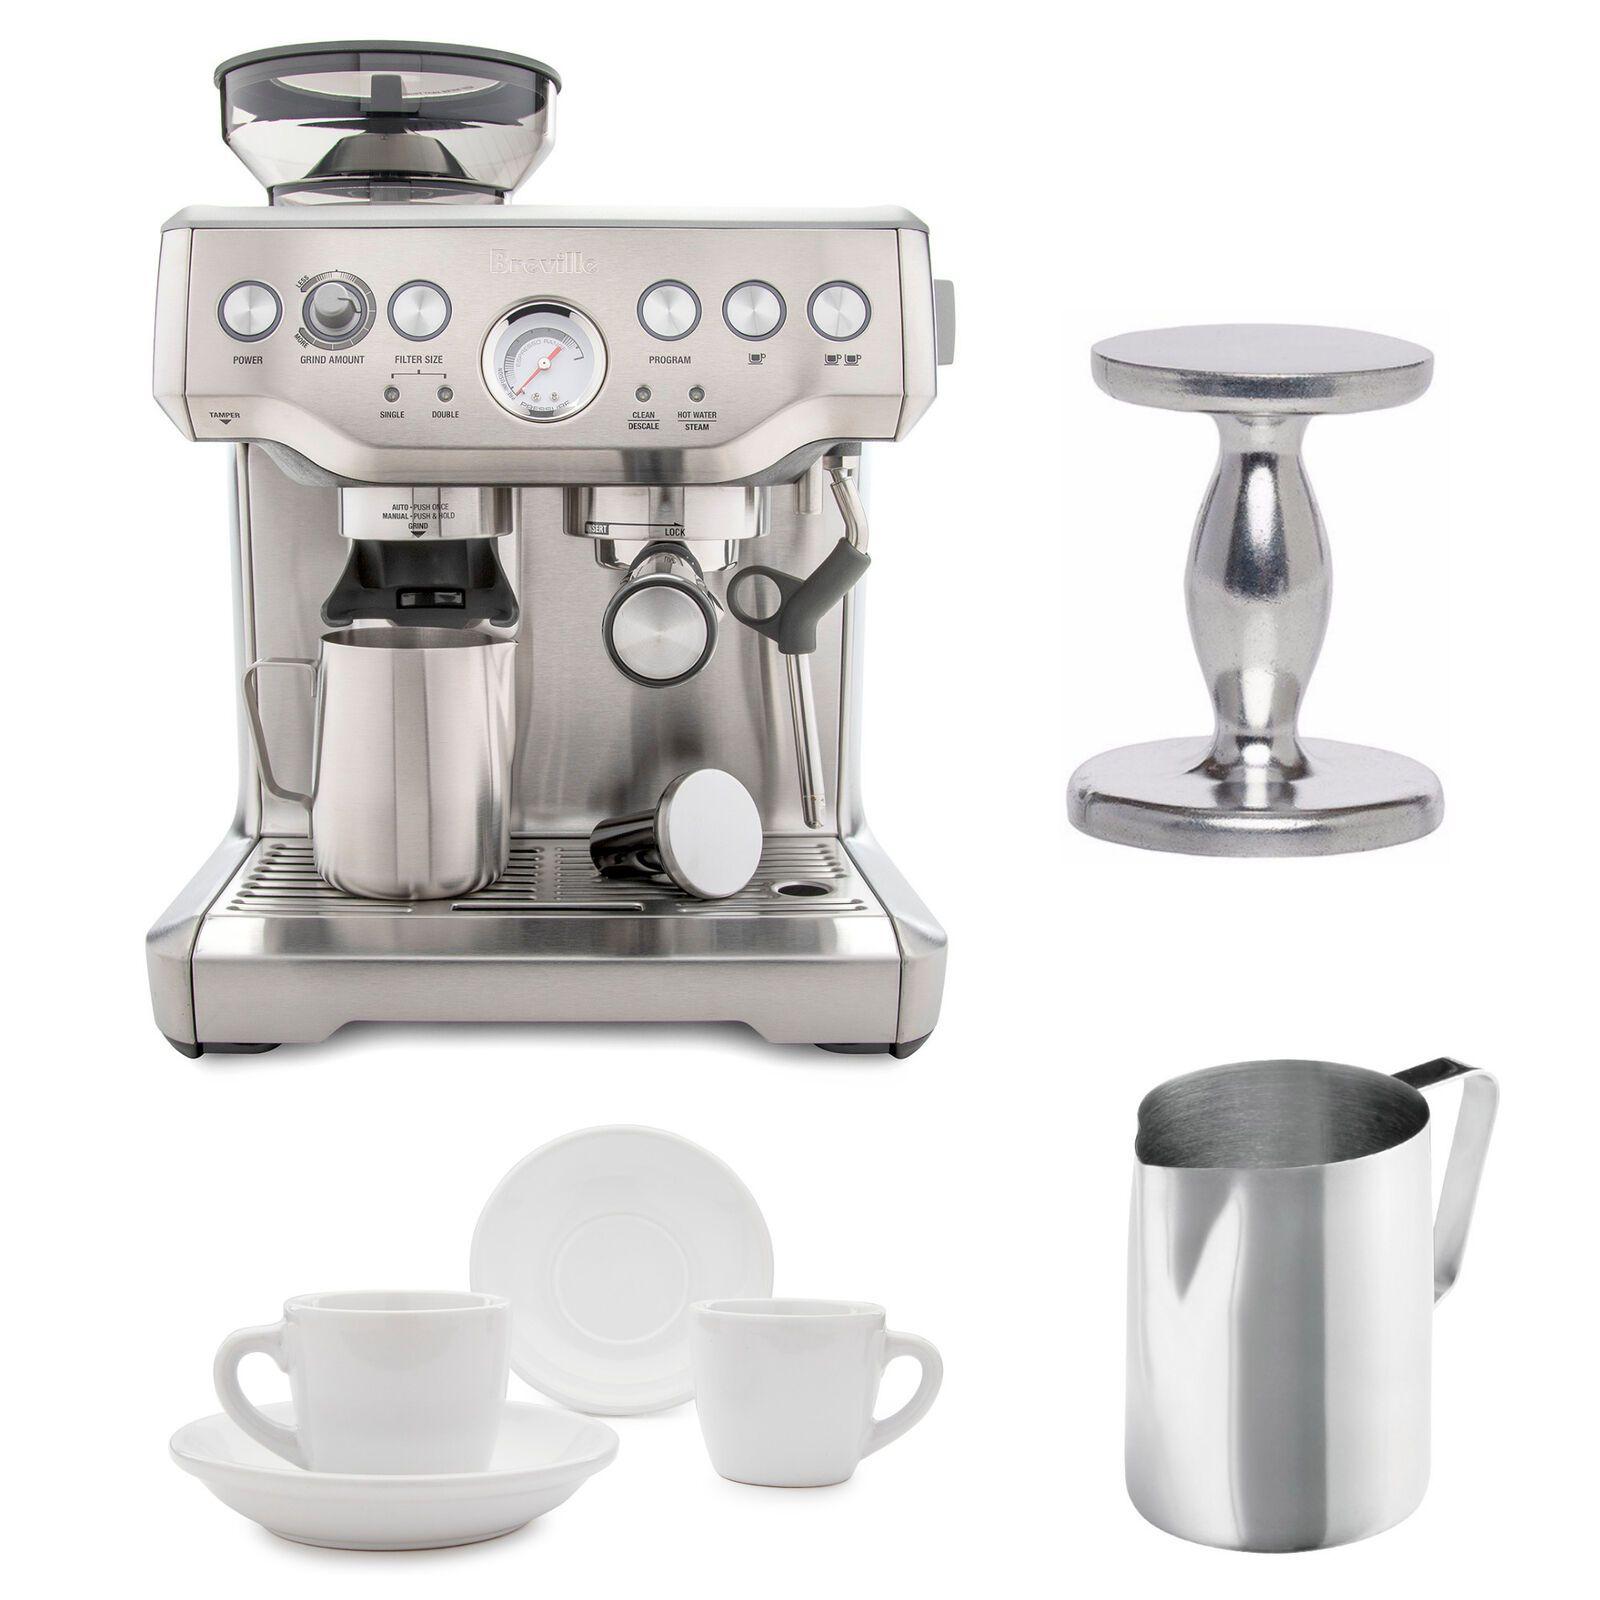 Details About Breville Bes870xl Barista Express Espresso Machine With Accessory Bundle In 2020 Espresso Machine Reviews Espresso